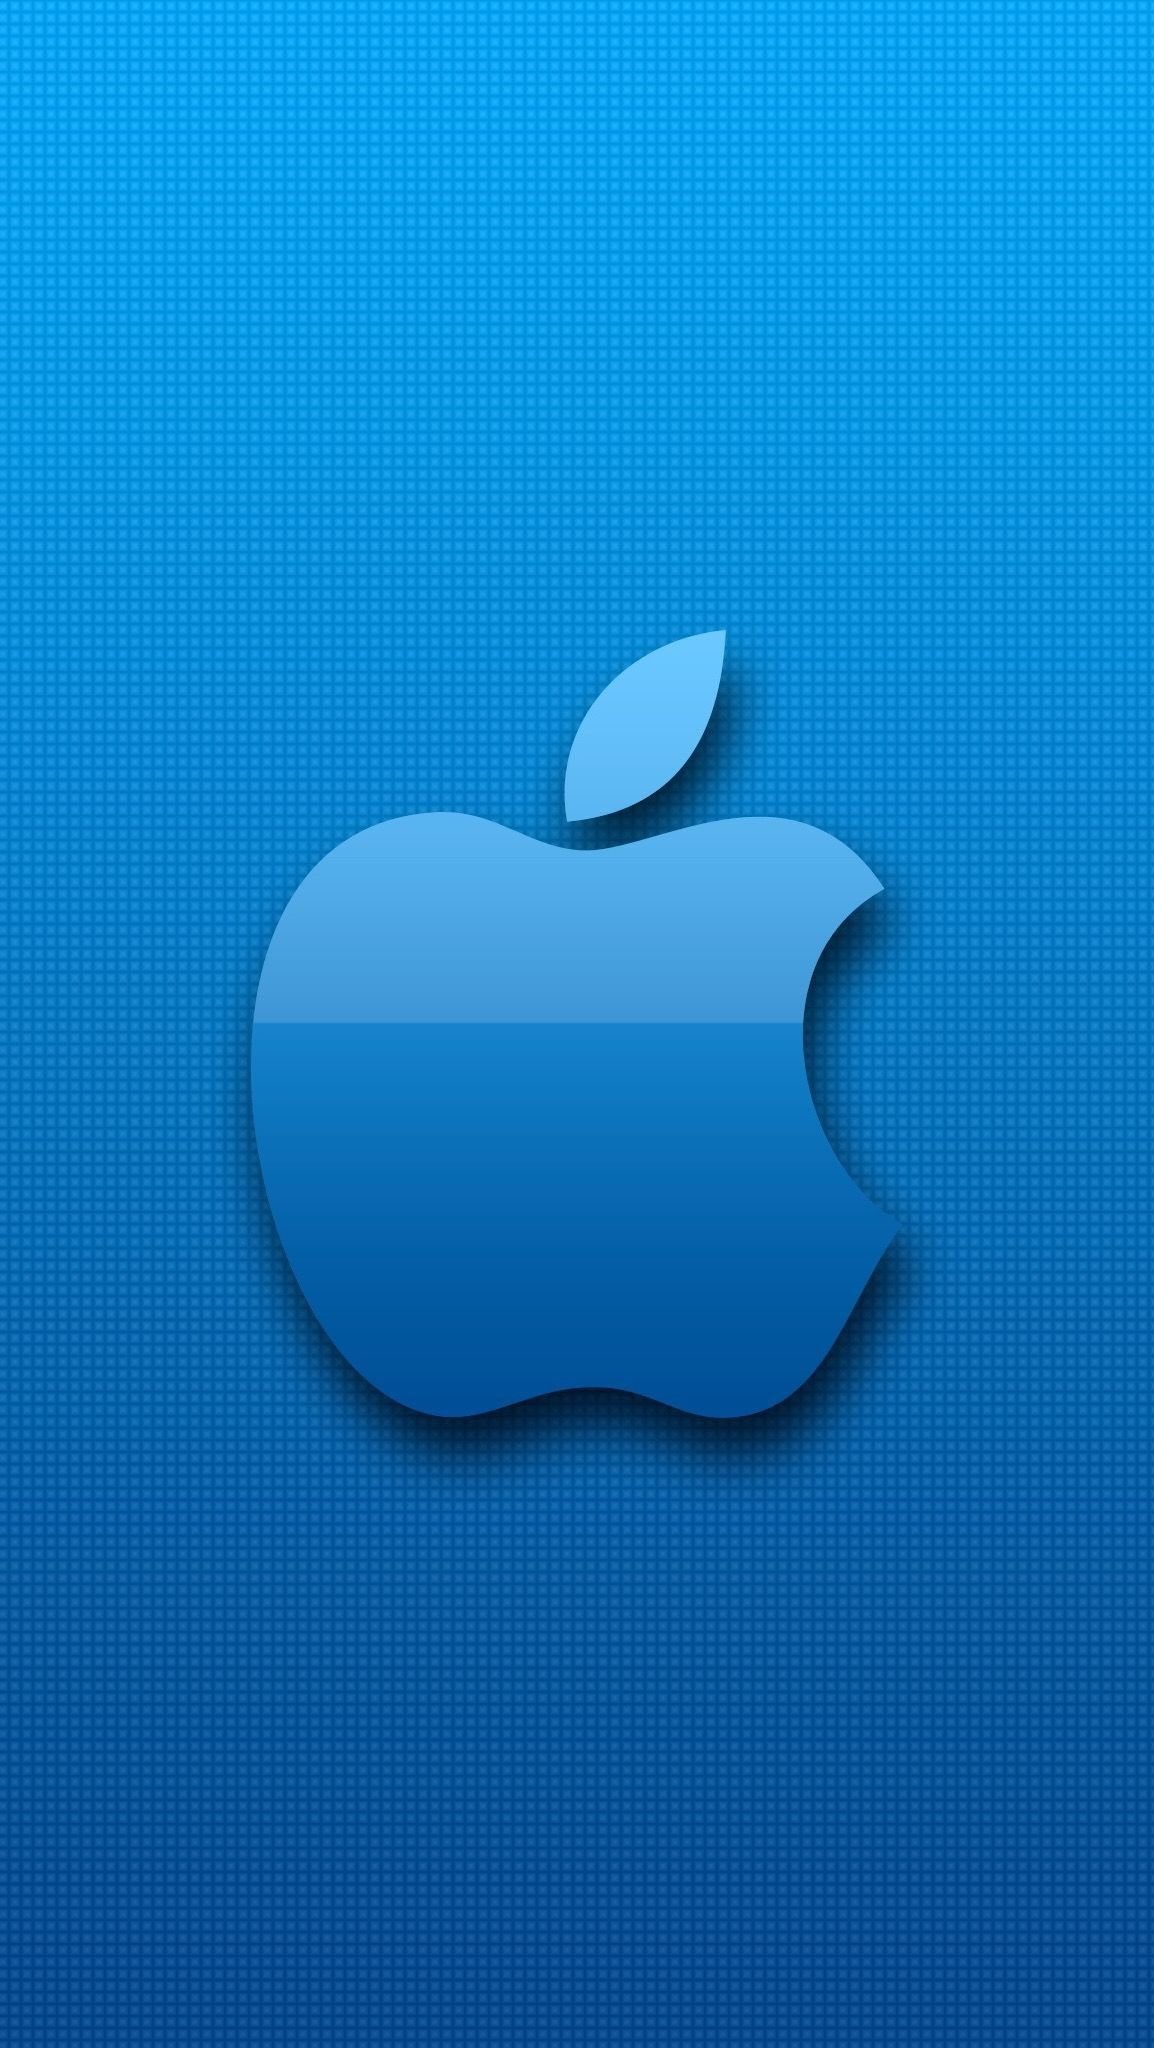 Iphone 7 Apple Logo Wallpaper 4k